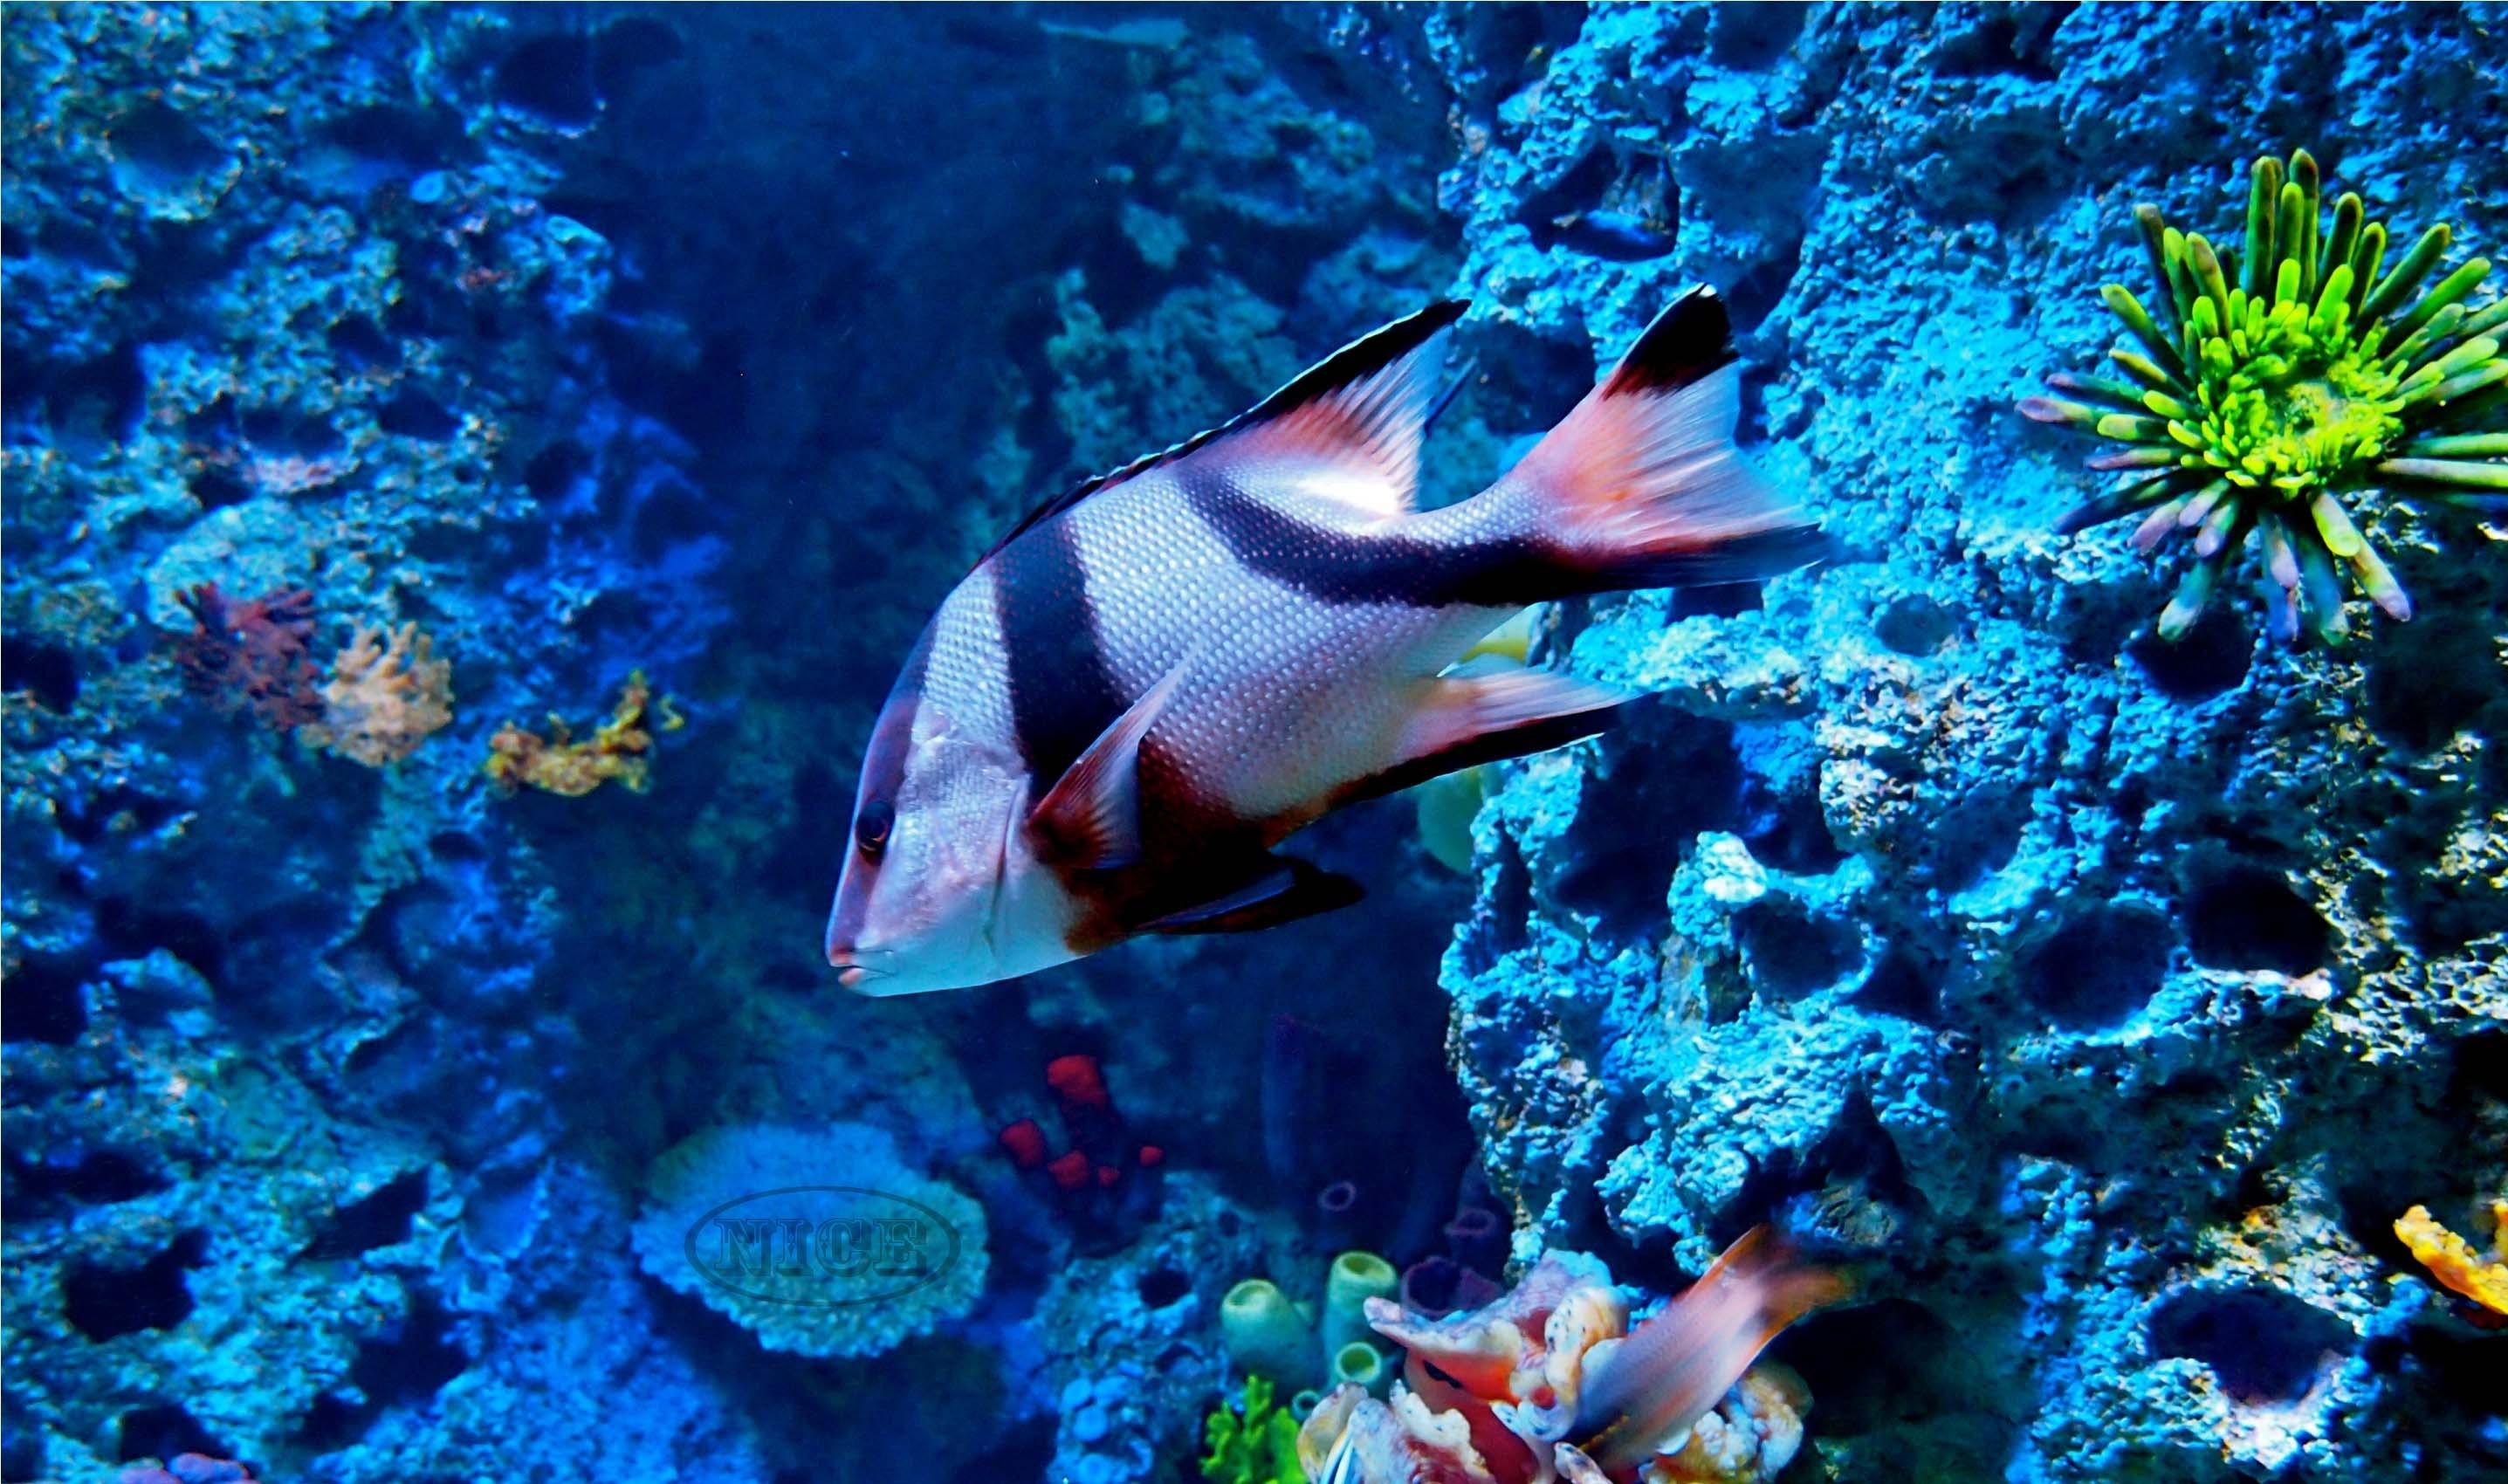 ocean life wallpapers - wallpaper cave